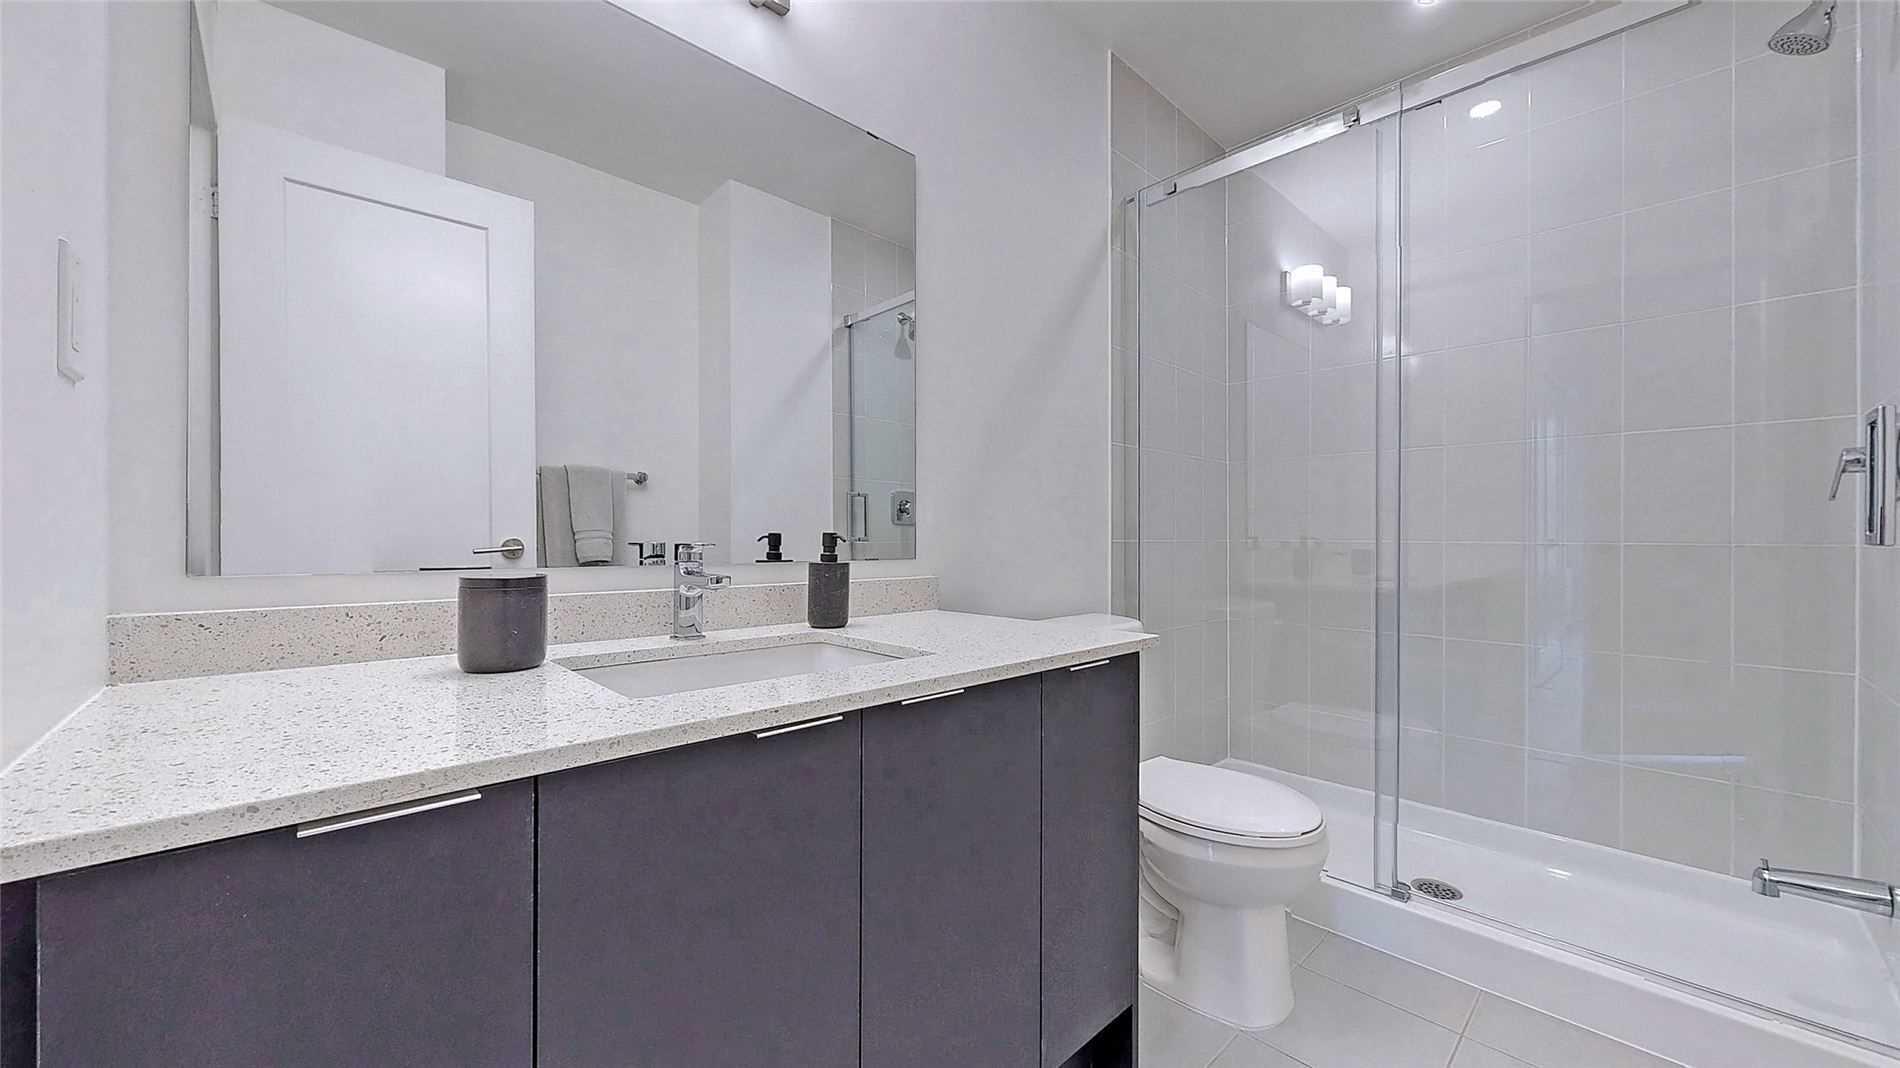 Condo Townhouse For Lease In Brampton , 3 Bedrooms Bedrooms, ,3 BathroomsBathrooms,Condo Townhouse,For Lease,109,Malta